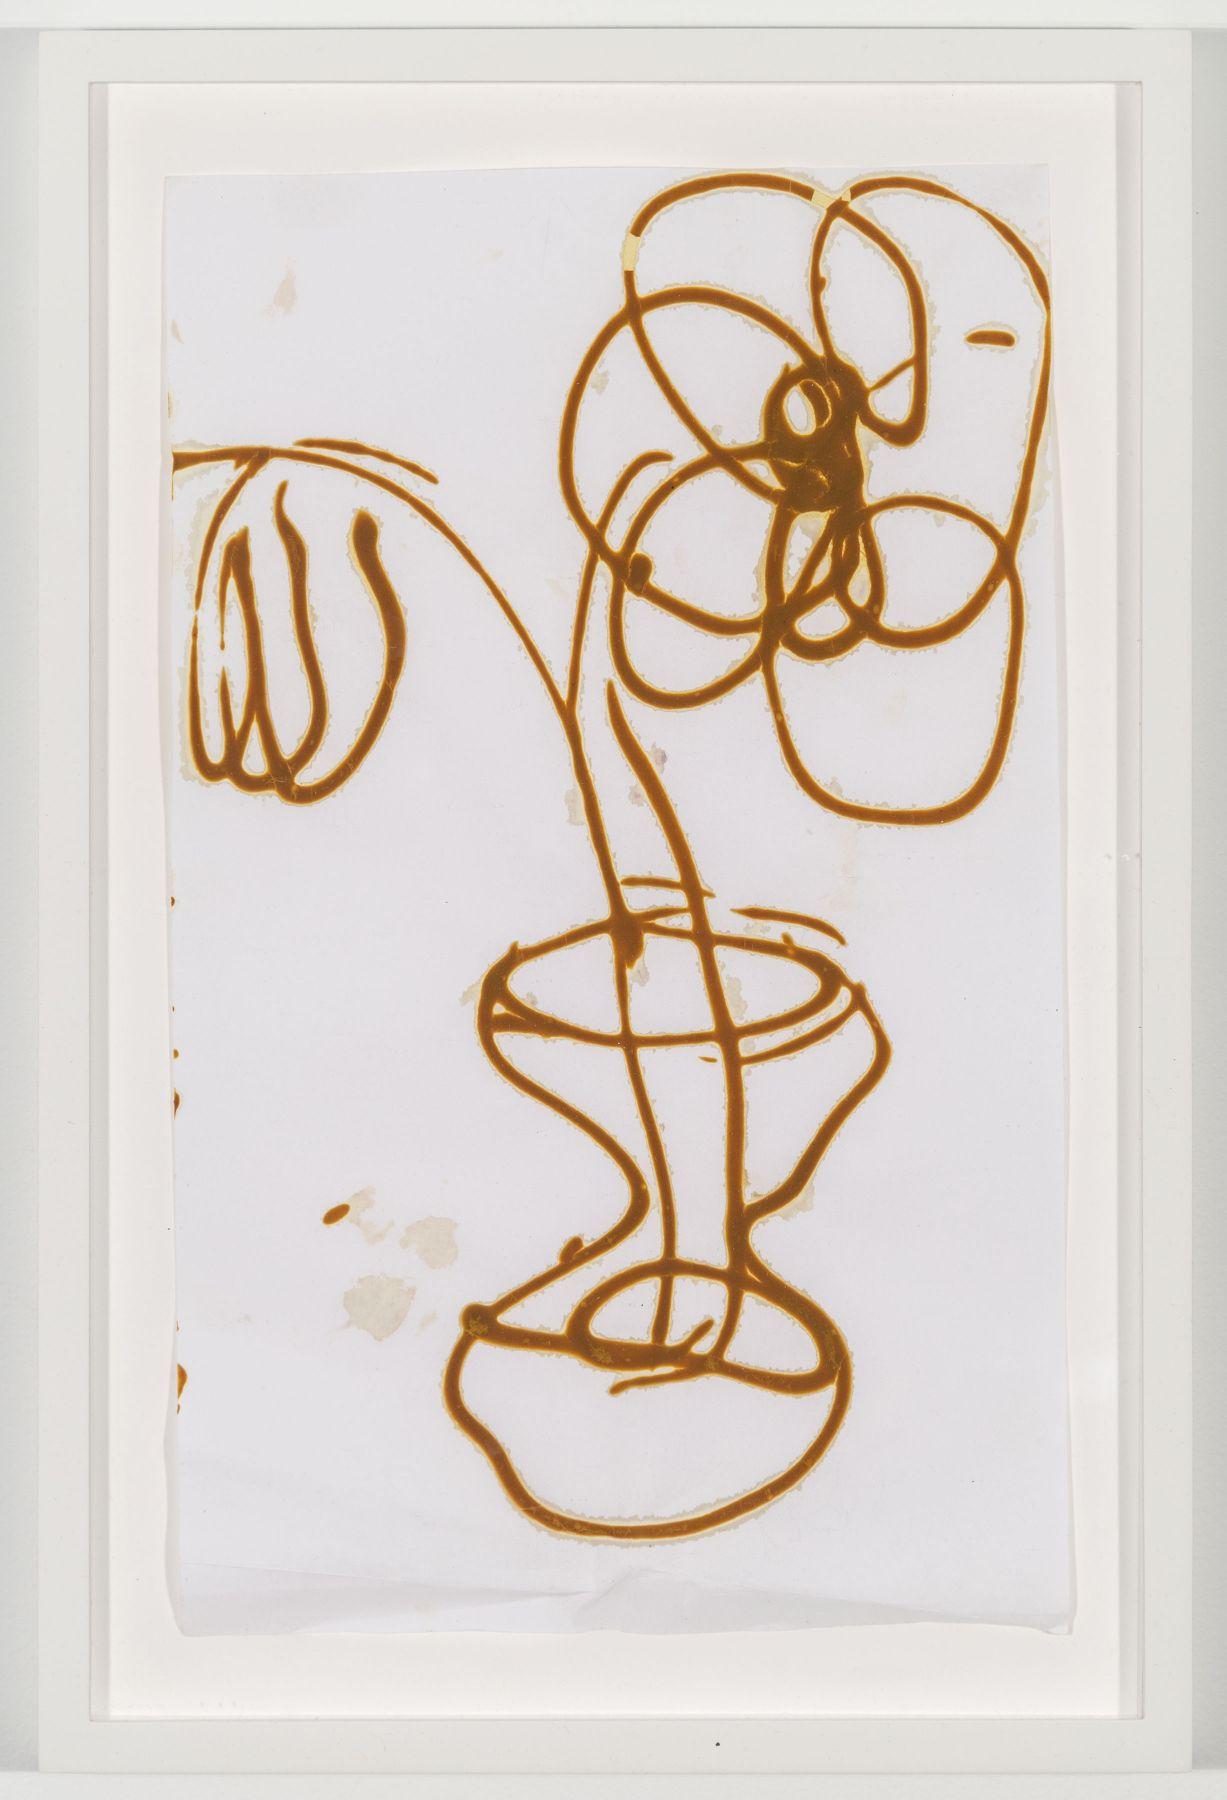 BRIAN BELOTT, Mustard Drawing (Flowers),2015